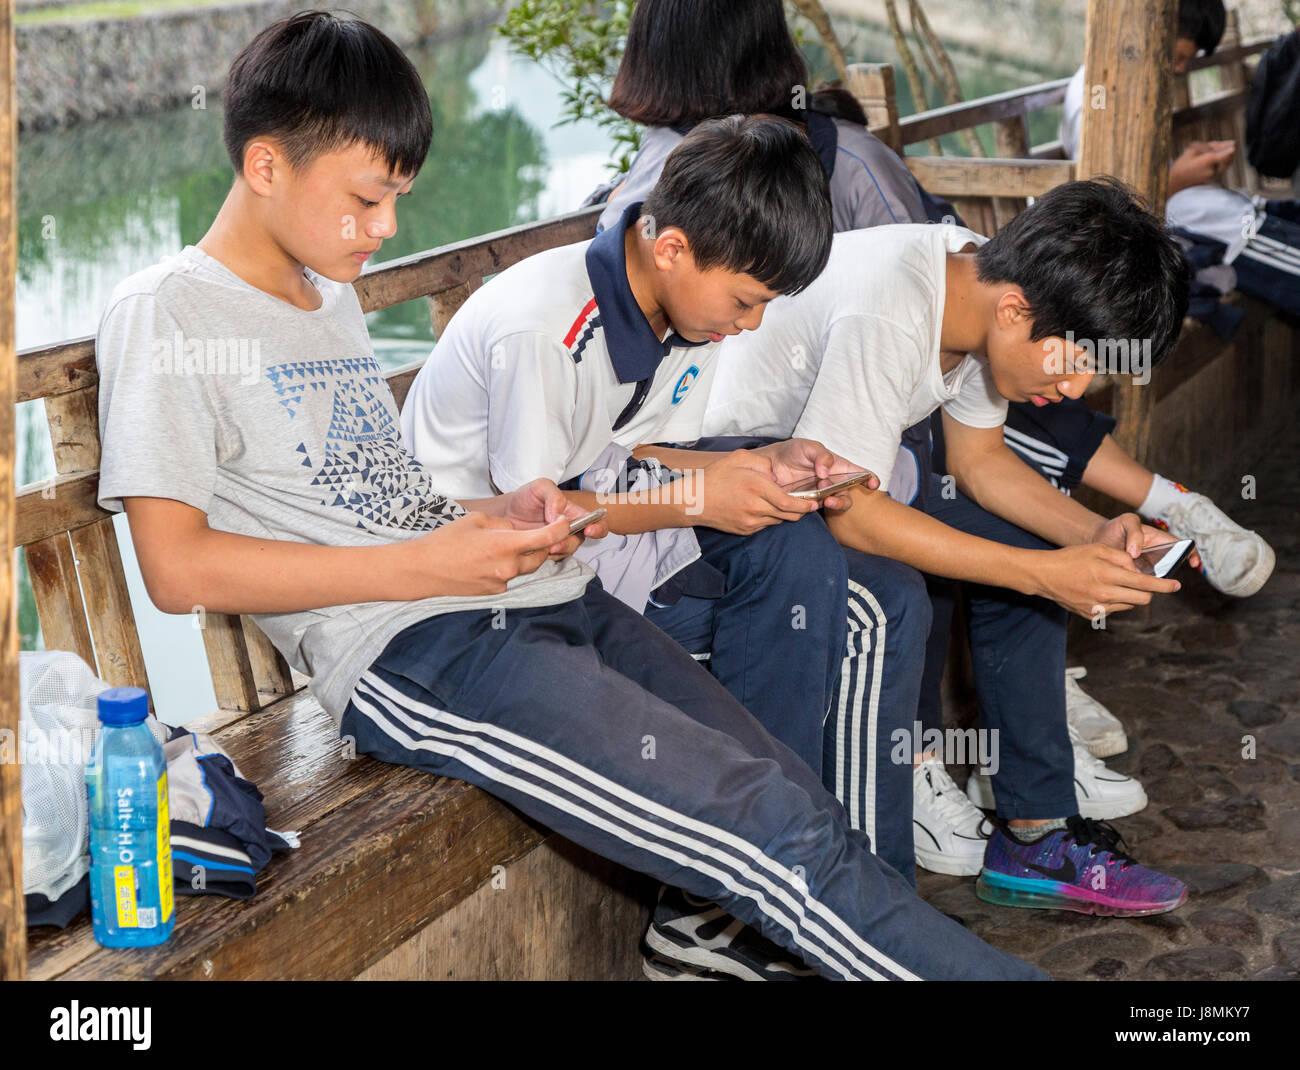 Yantou, Yongjia, Zhejiang, China.  Teenage Boys on Lishui Street Examining Their Cell Phones. - Stock Image